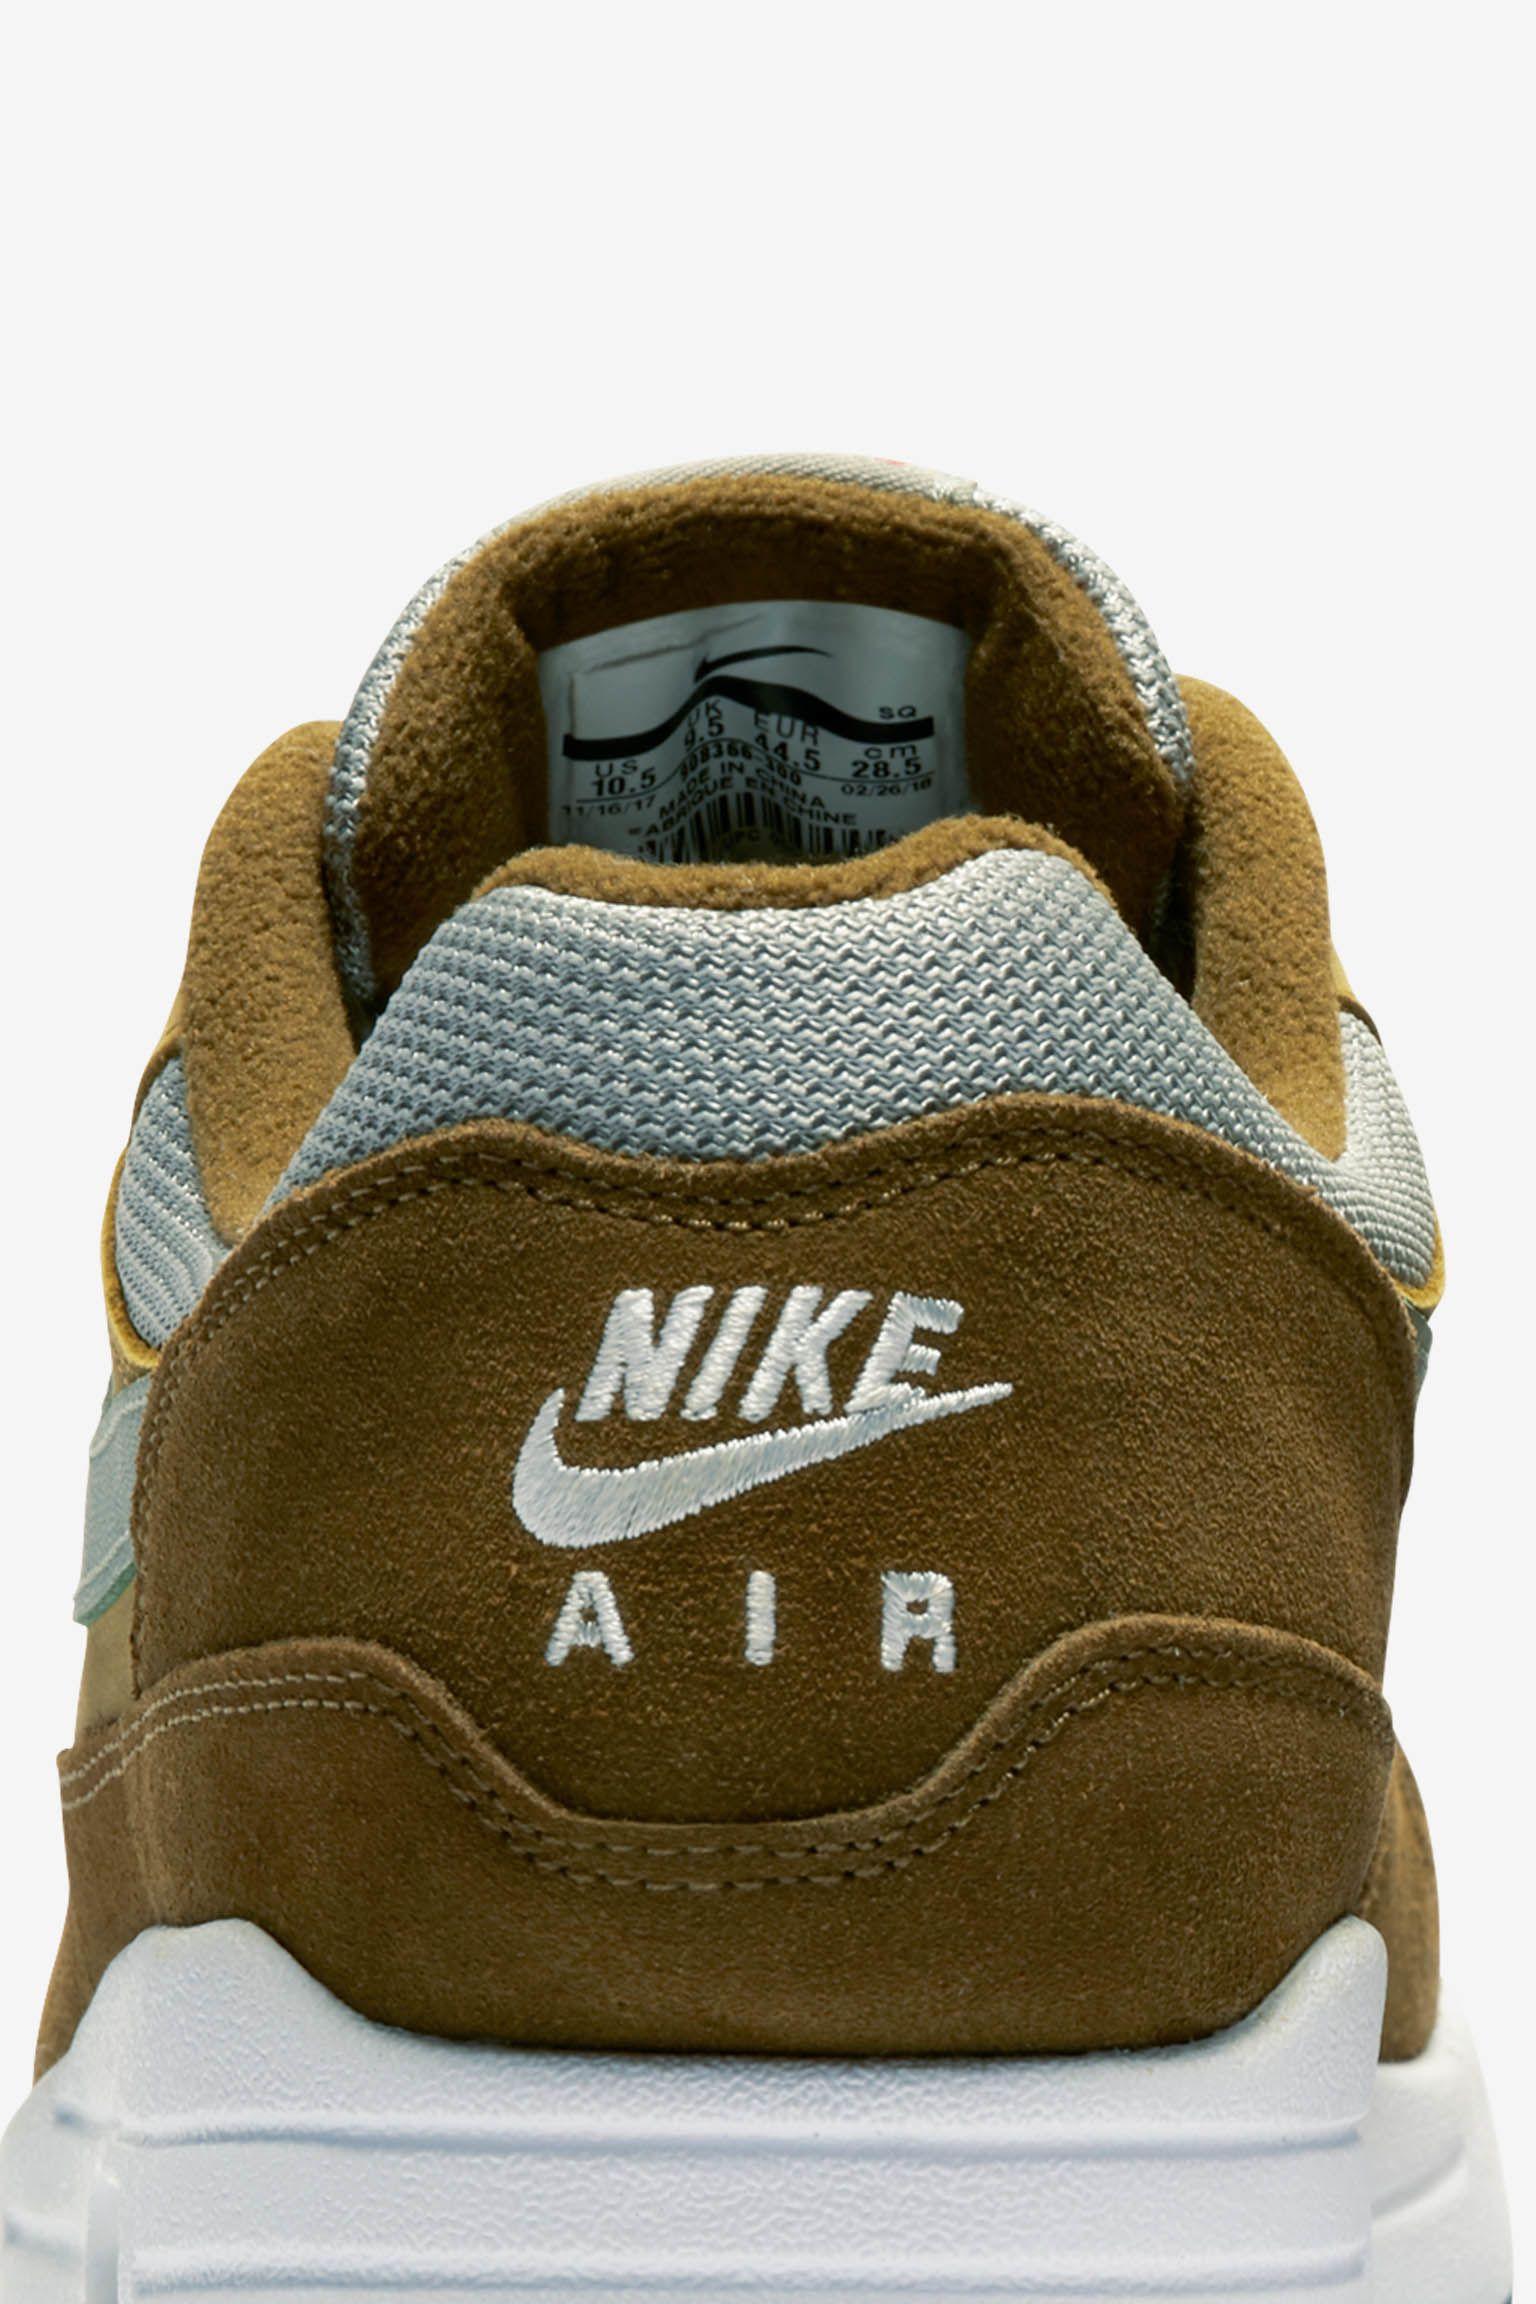 Nike Air Max 1 Premium 'Green Curry' Release Date